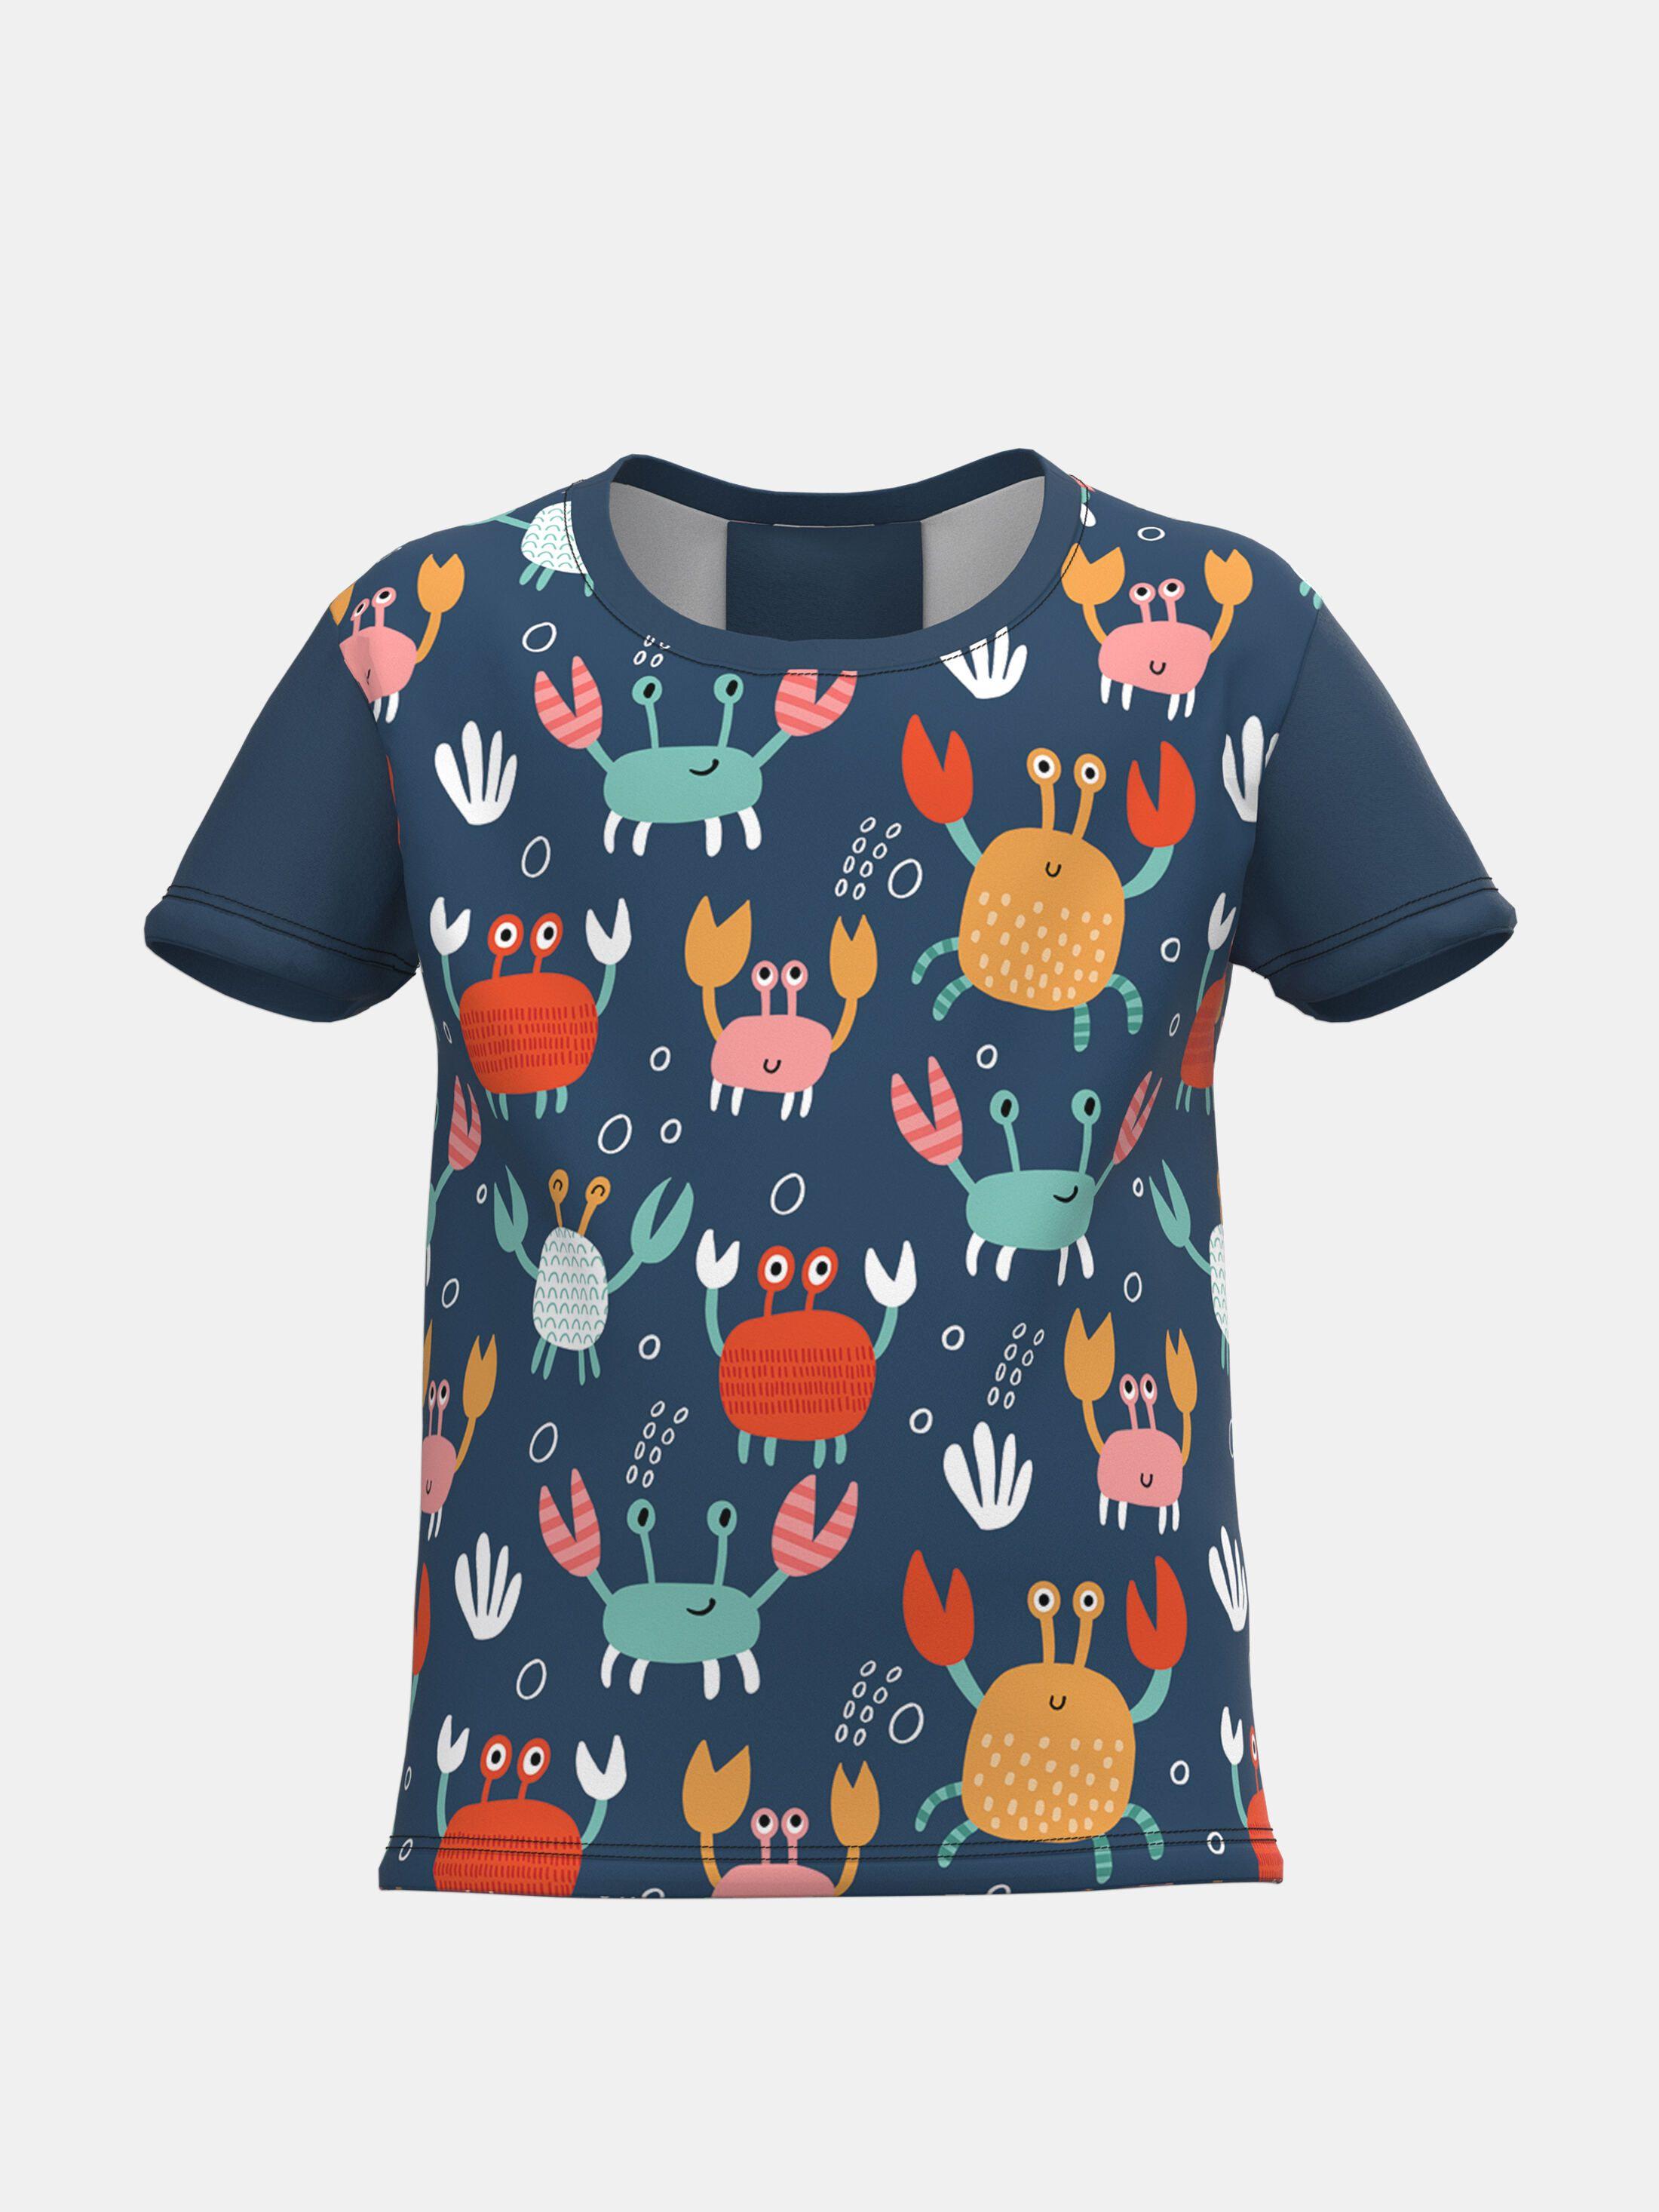 Printed Children's T-Shirts